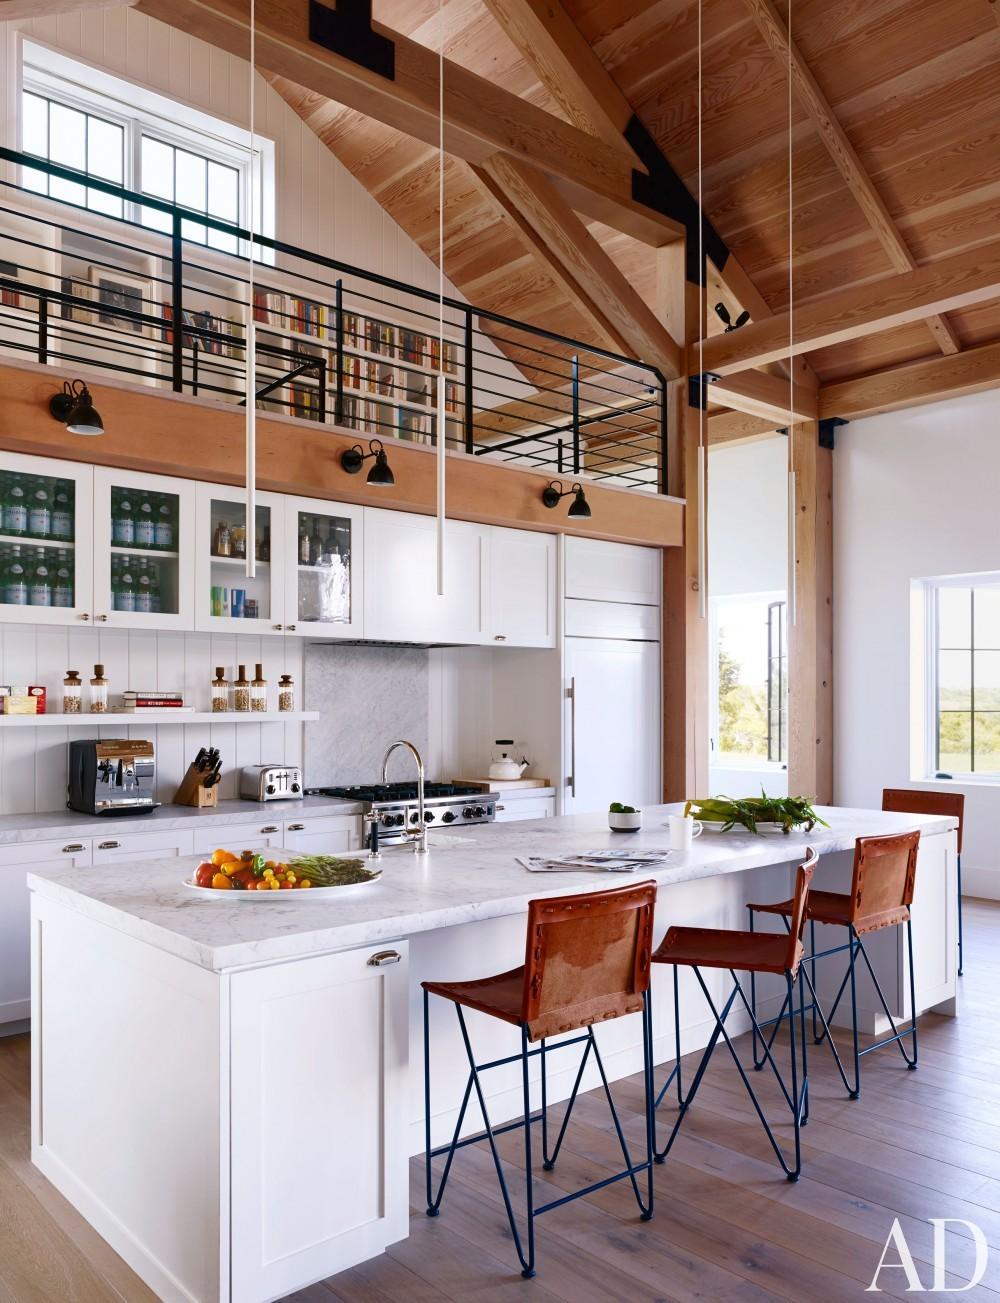 Modern Kitchen by Ashe + Leandro and Ashe + Leandro in Martha\'s Vineyard, MA